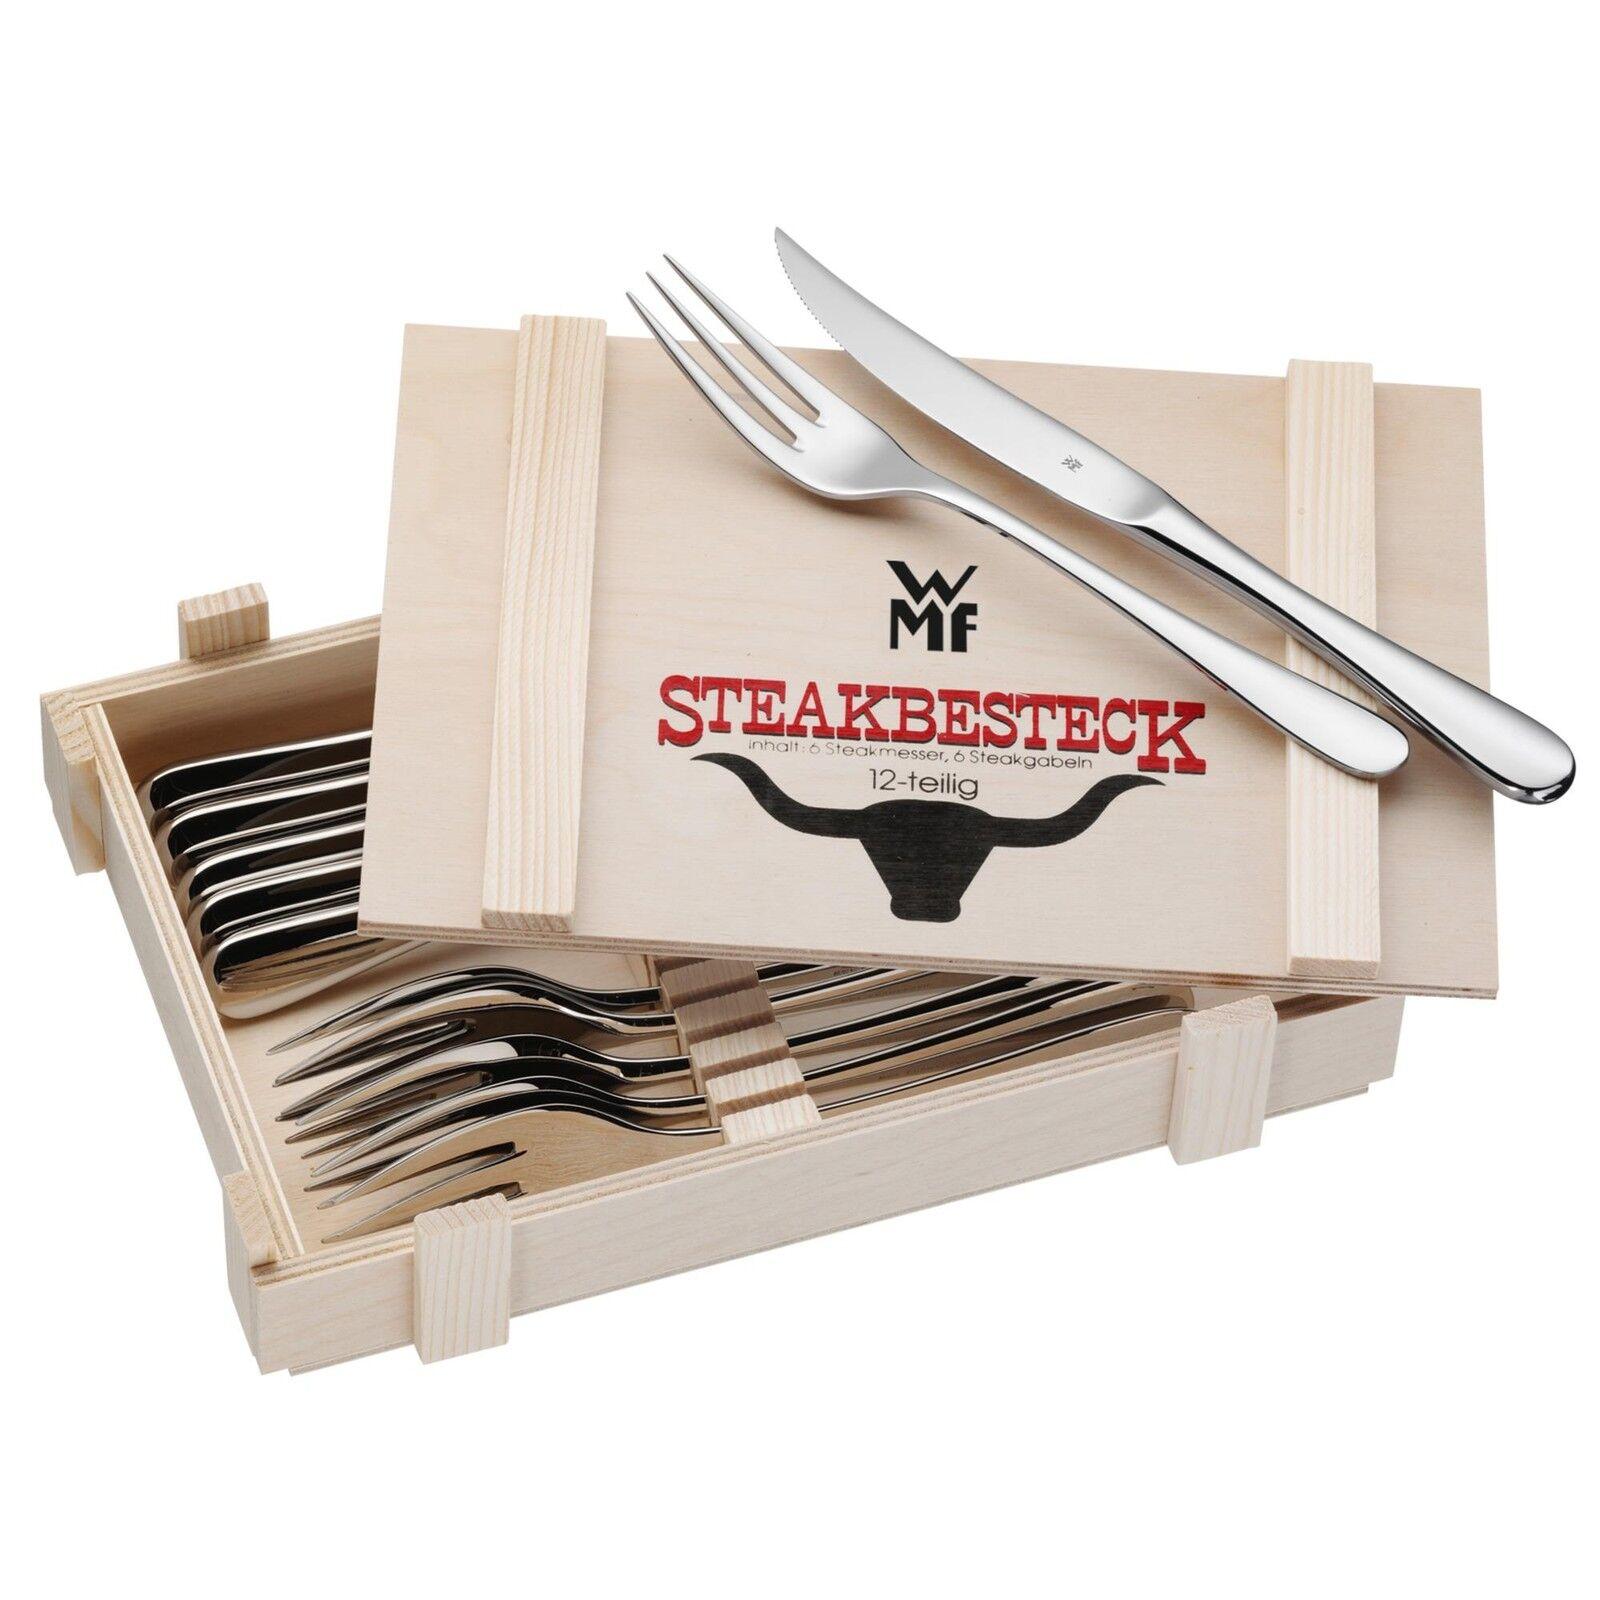 WMF Steakbesteck-Set 12-teilig in Holzkiste Edelstahl rostfrei NEU